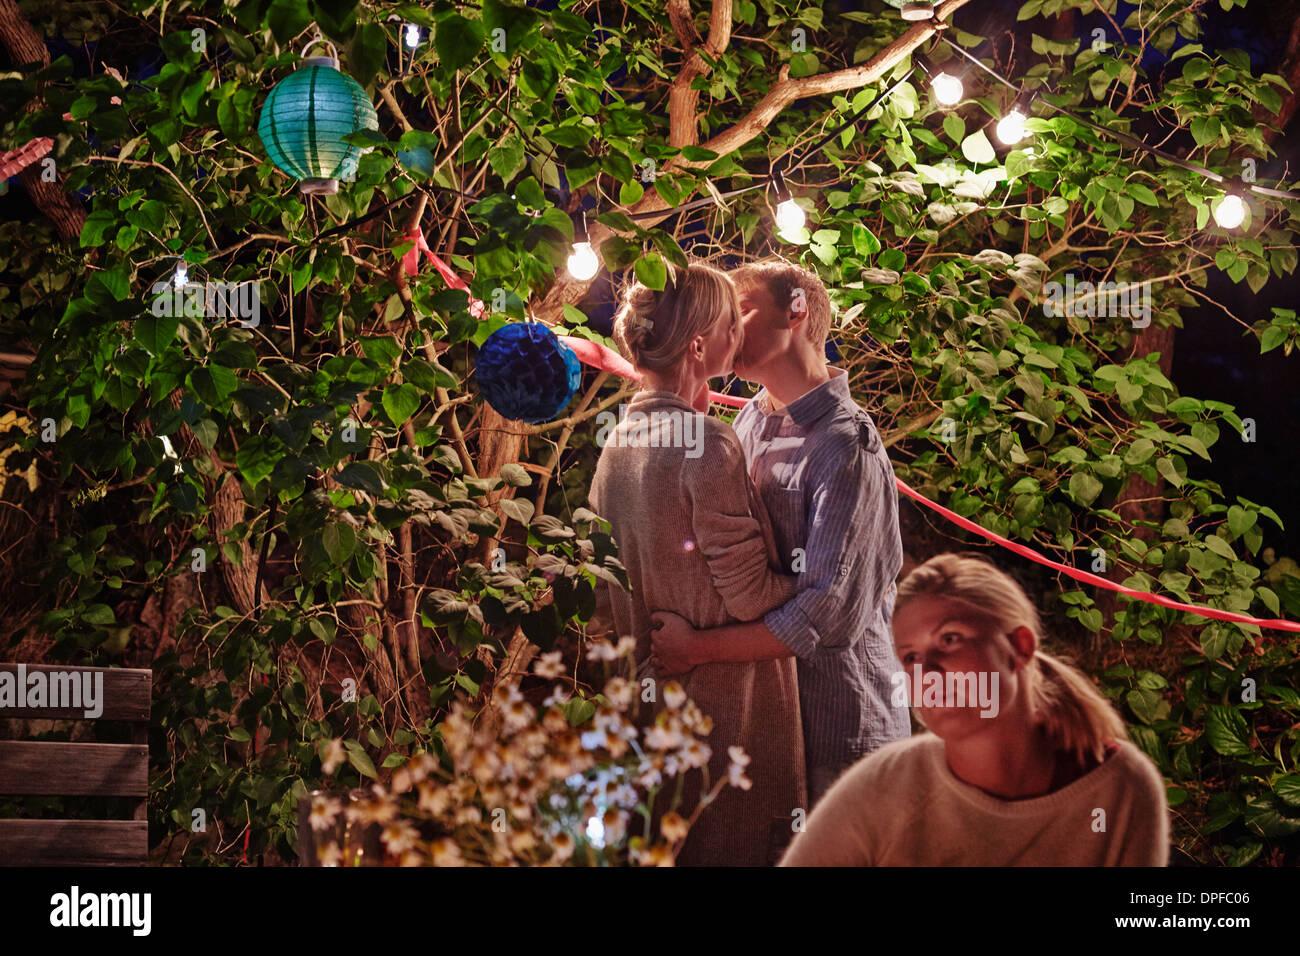 Pareja joven abrazando a garden party en la noche Imagen De Stock